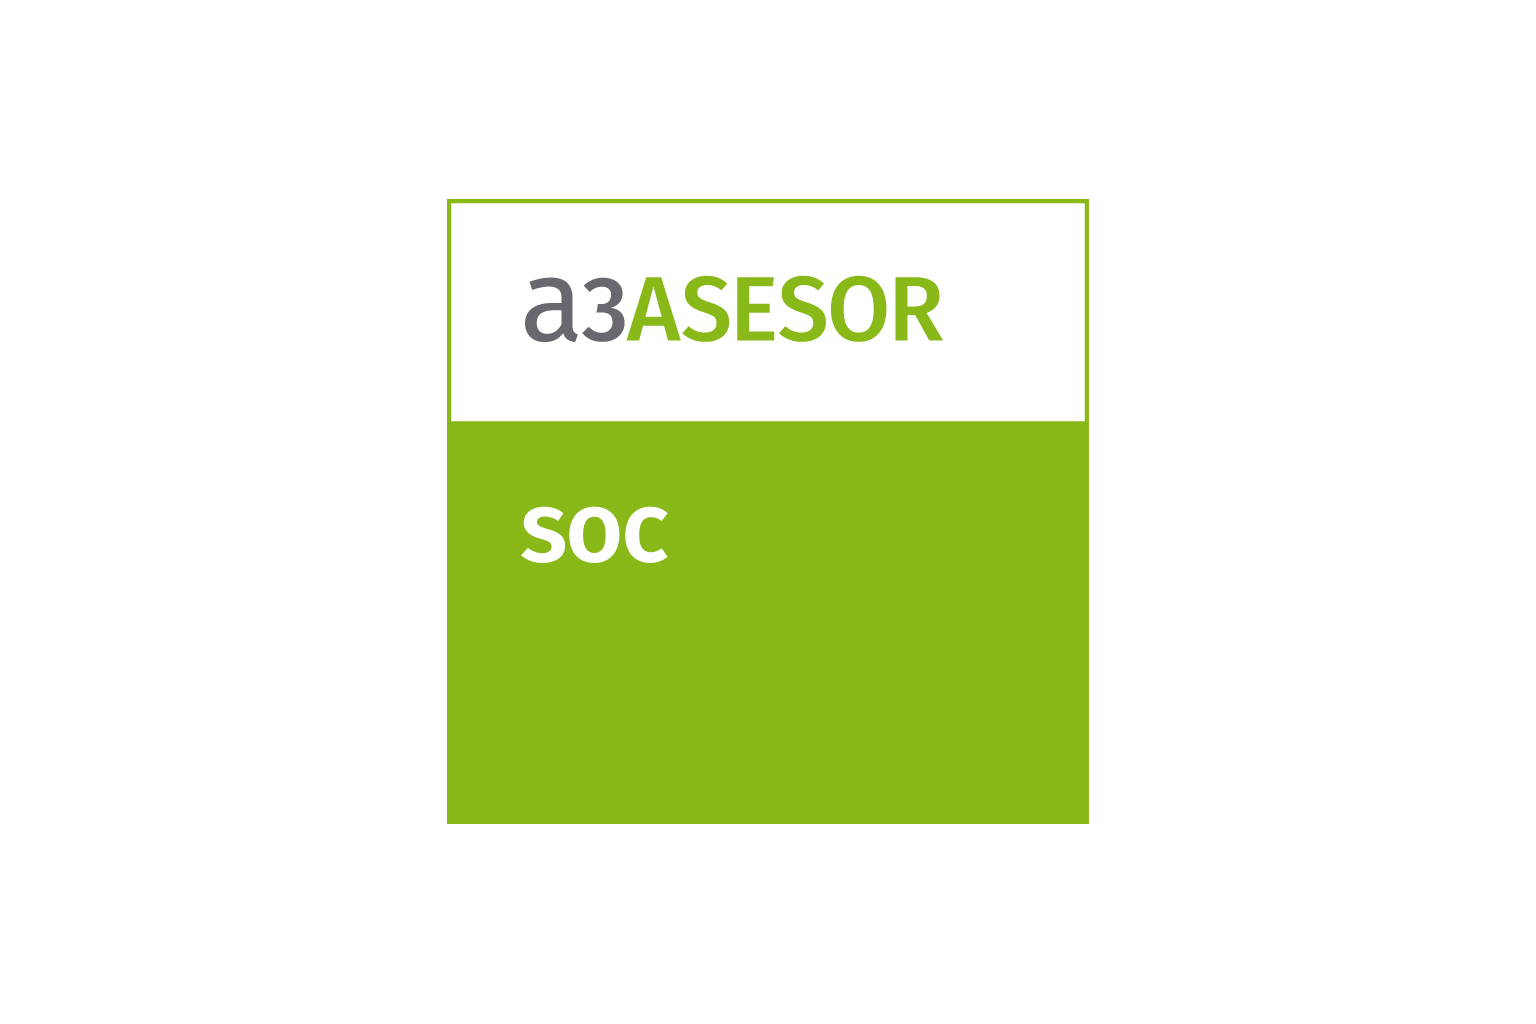 a3ASESOR-soc-2